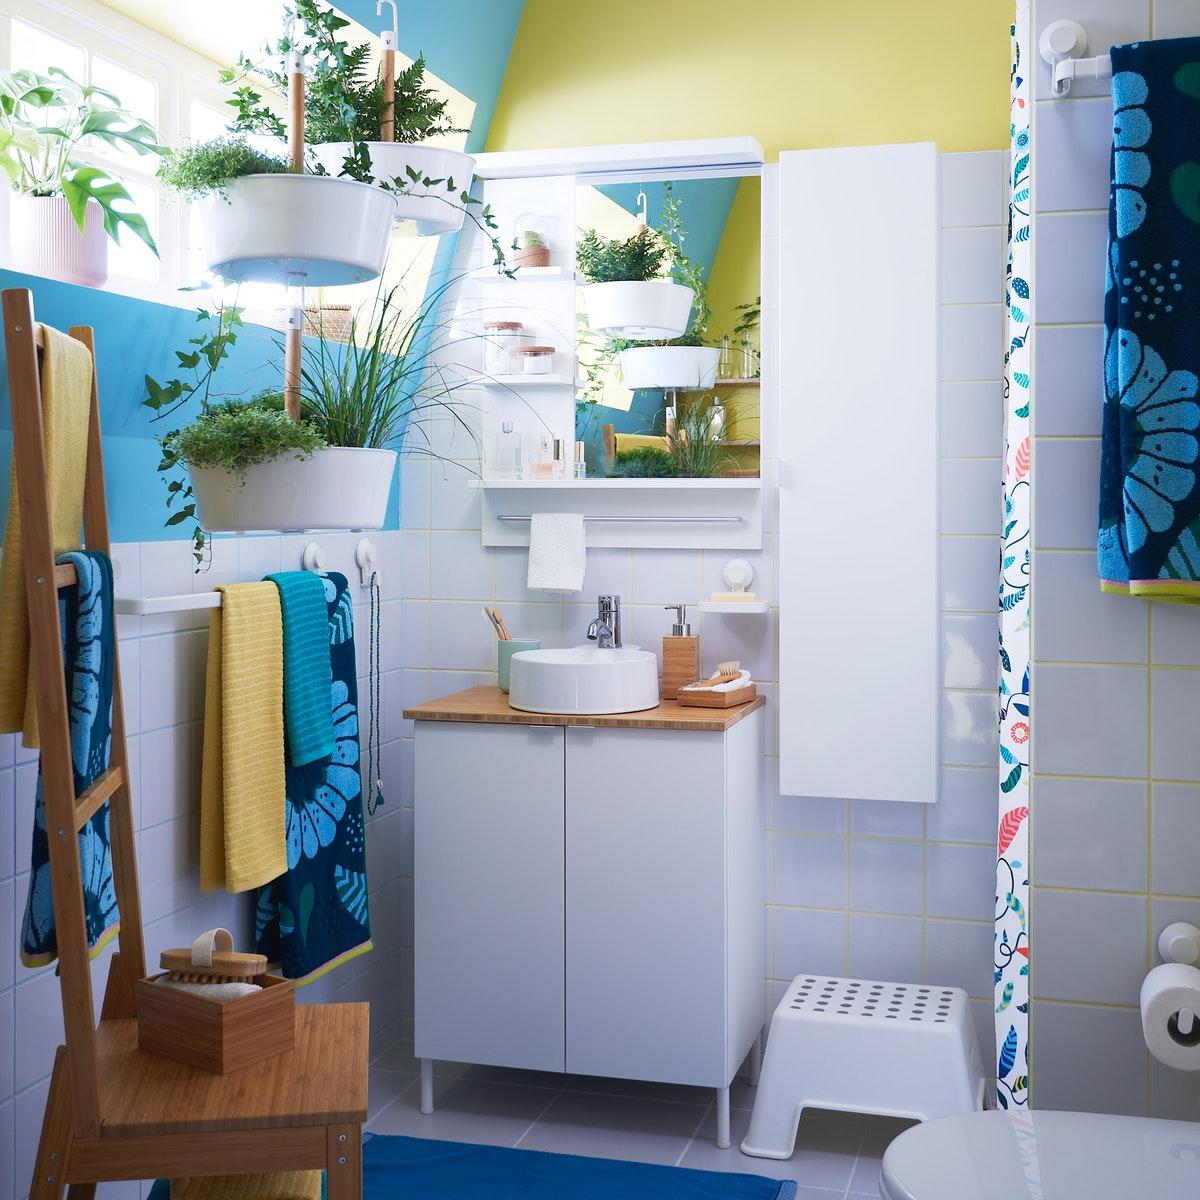 A cheerful small bathroom